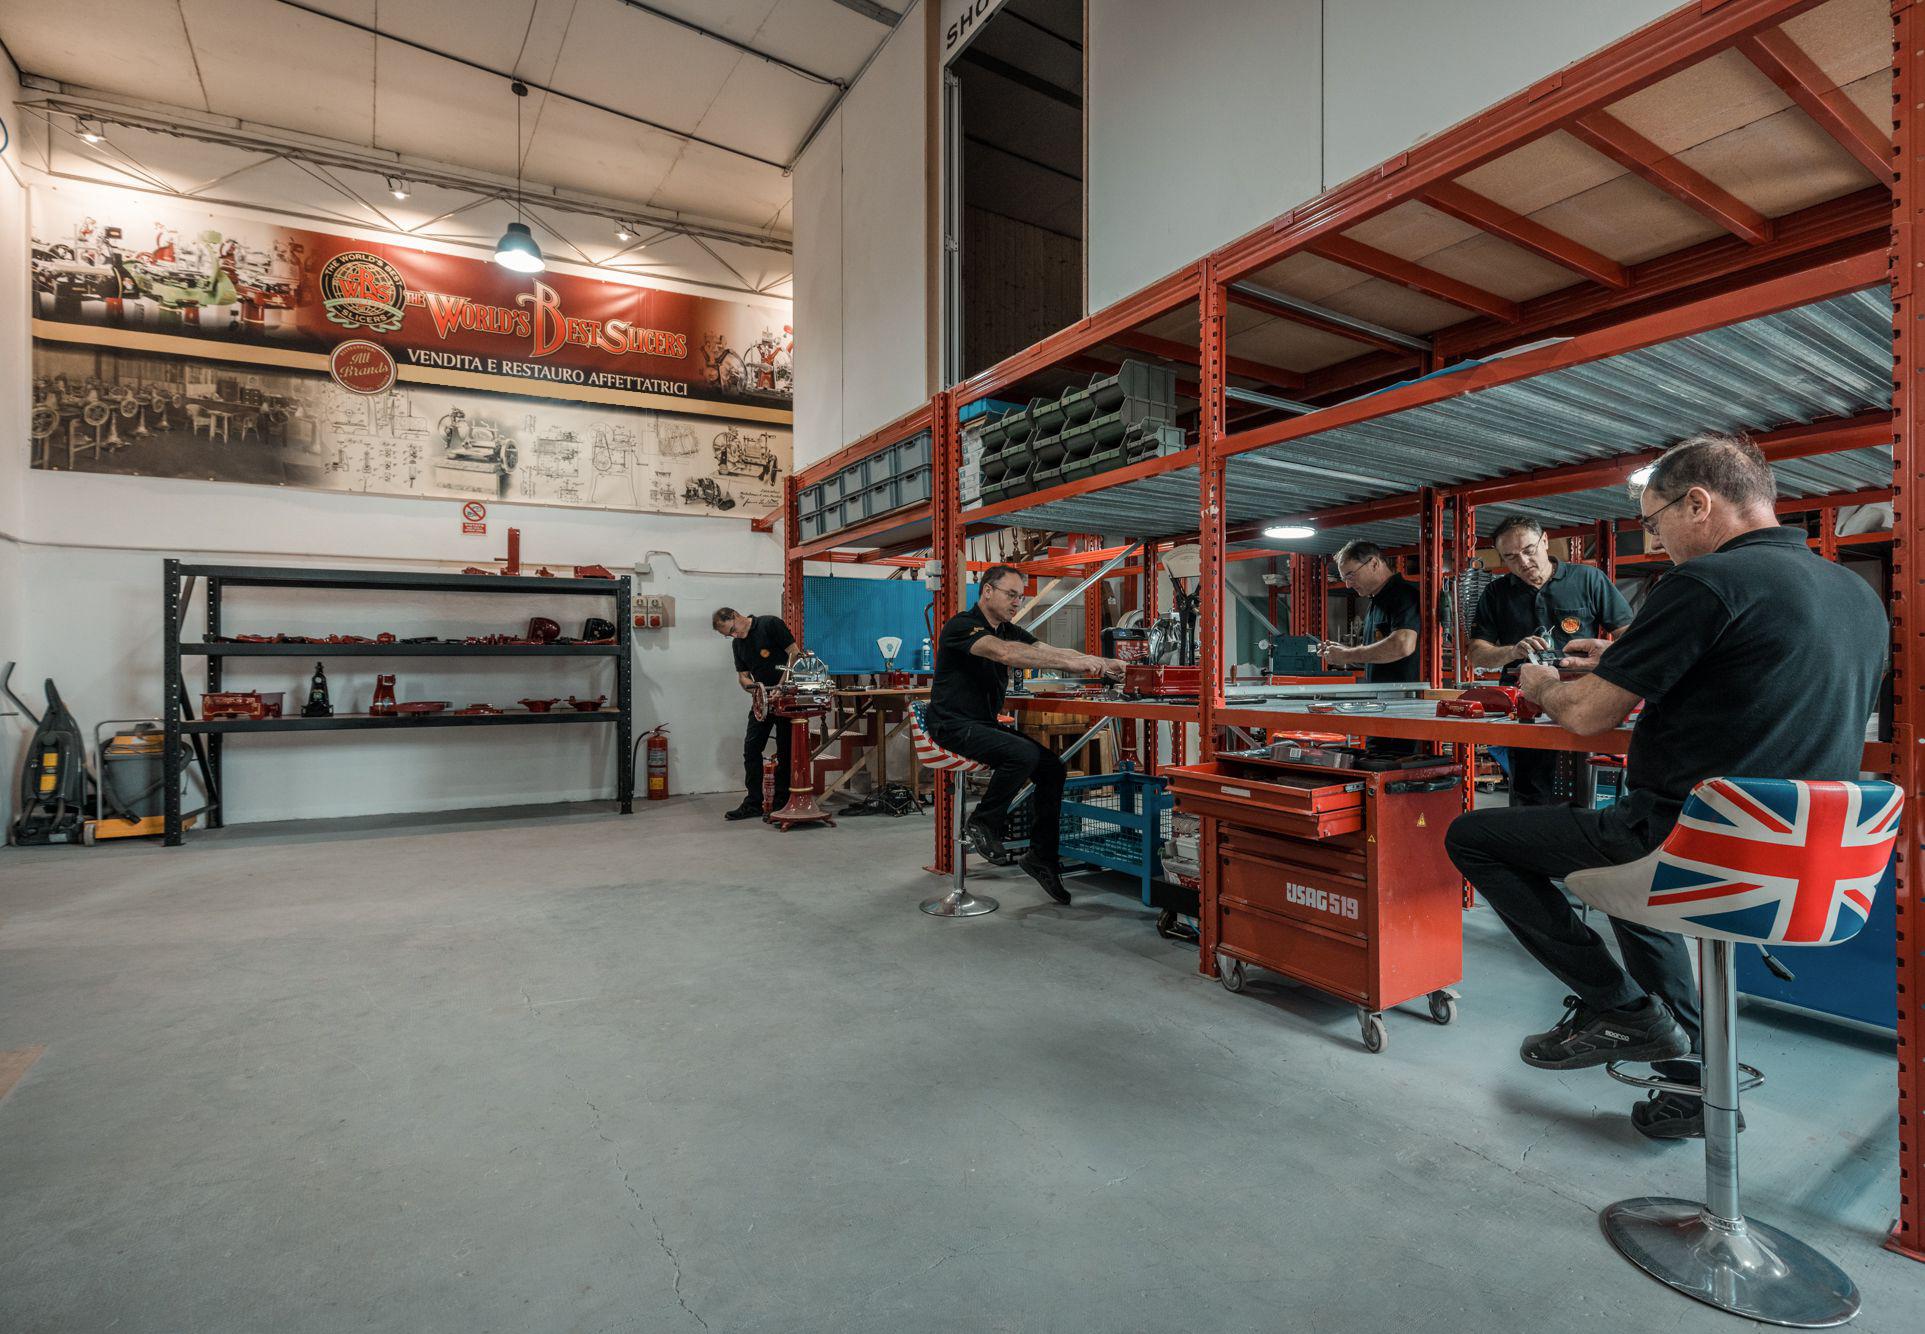 ER5_8303-1 Our restoration laboratory